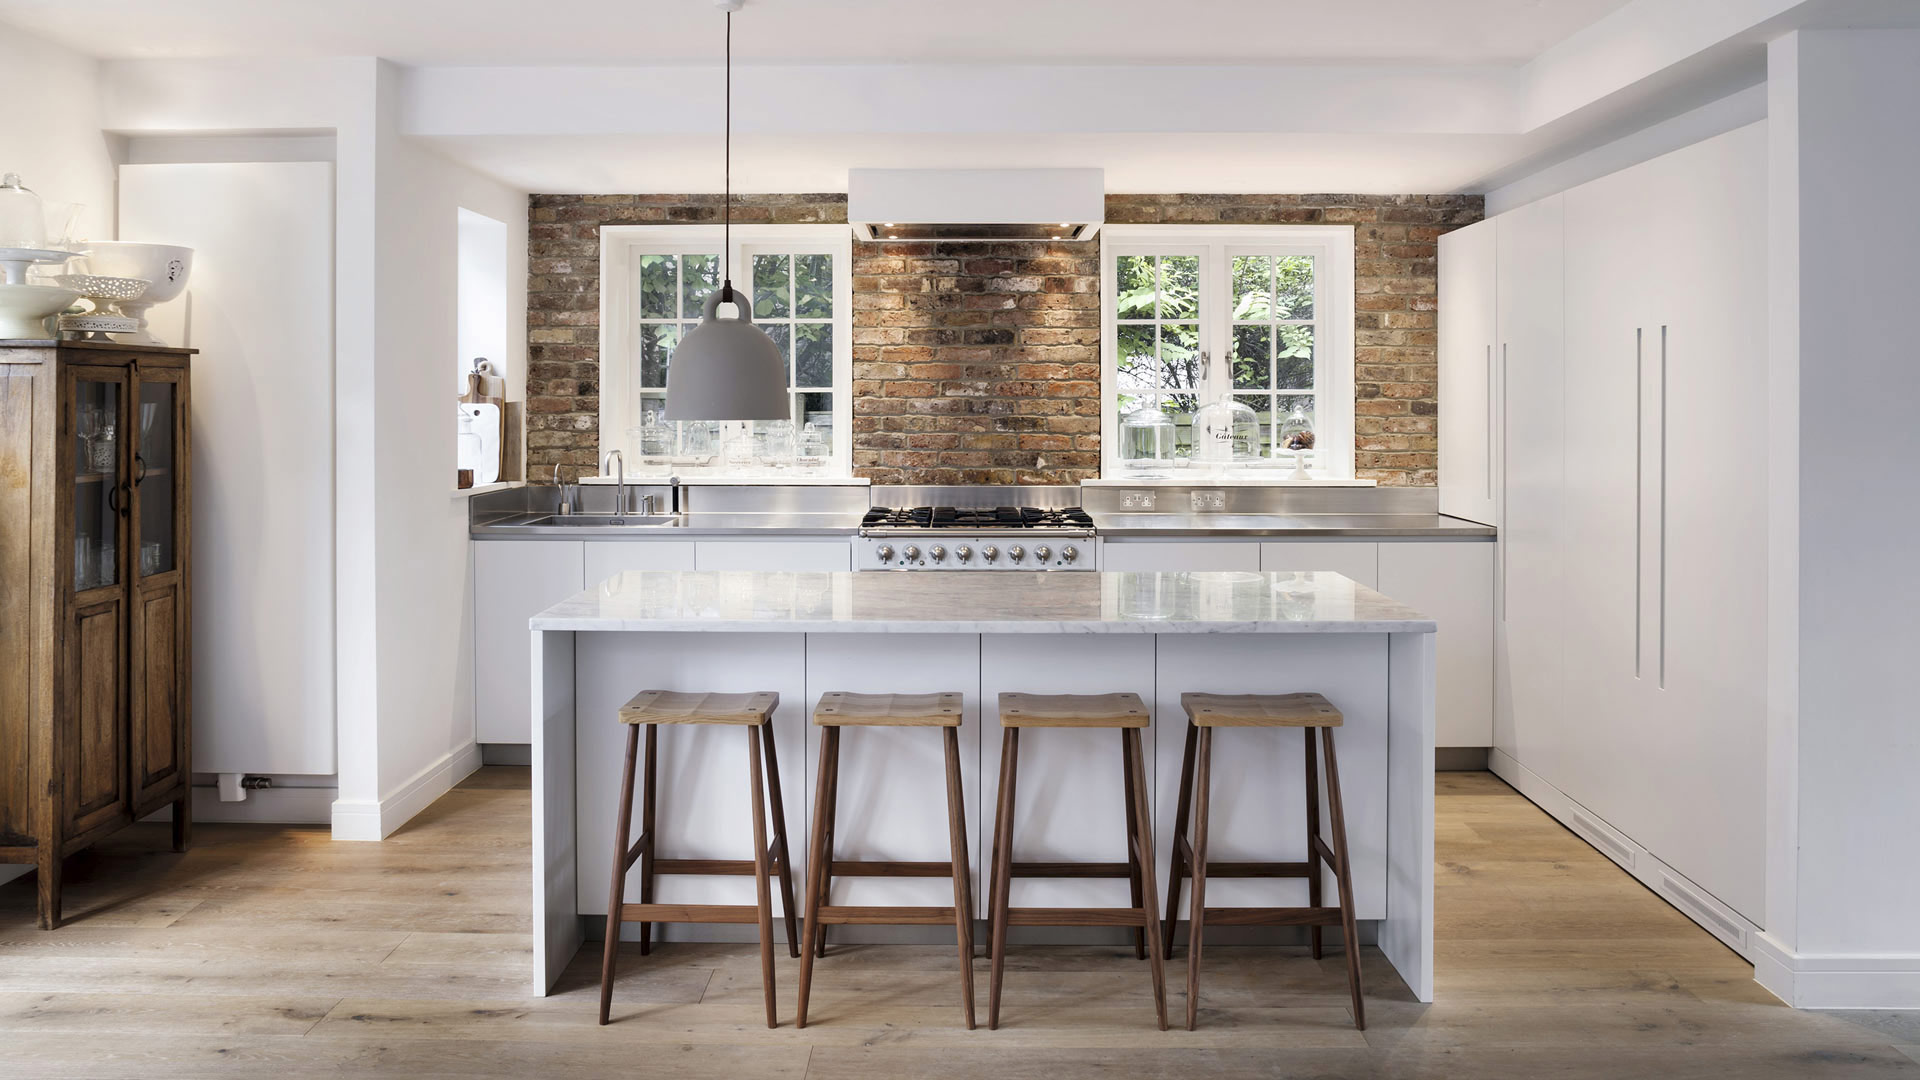 K6 tm italia - Dimensioni minime cucina bar ...